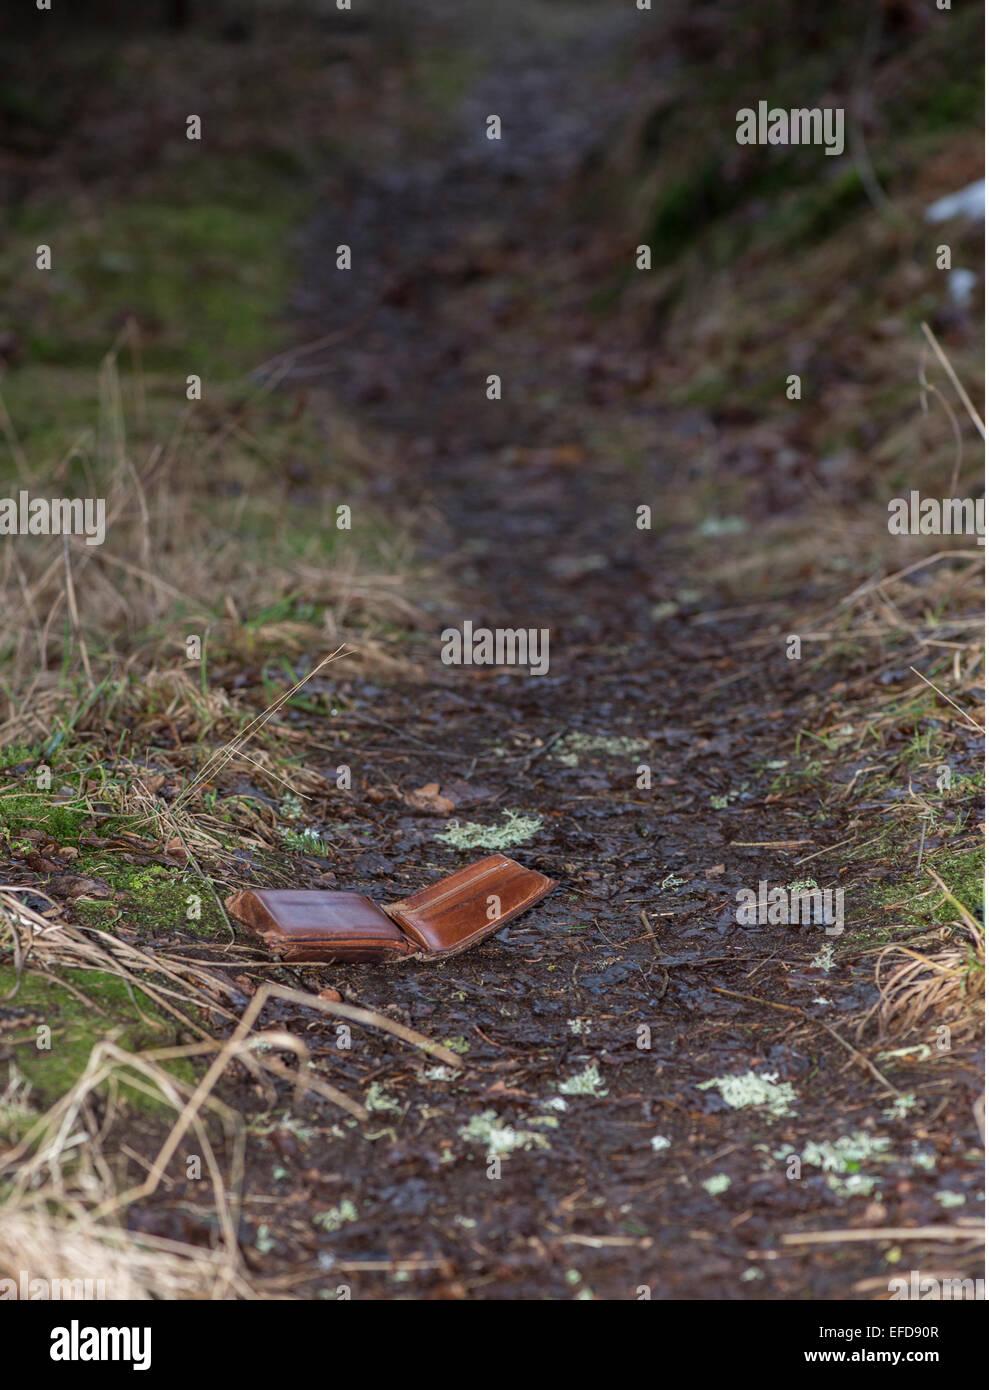 Leder-Portemonnaie auf Wanderweg im Wald verloren Stockbild